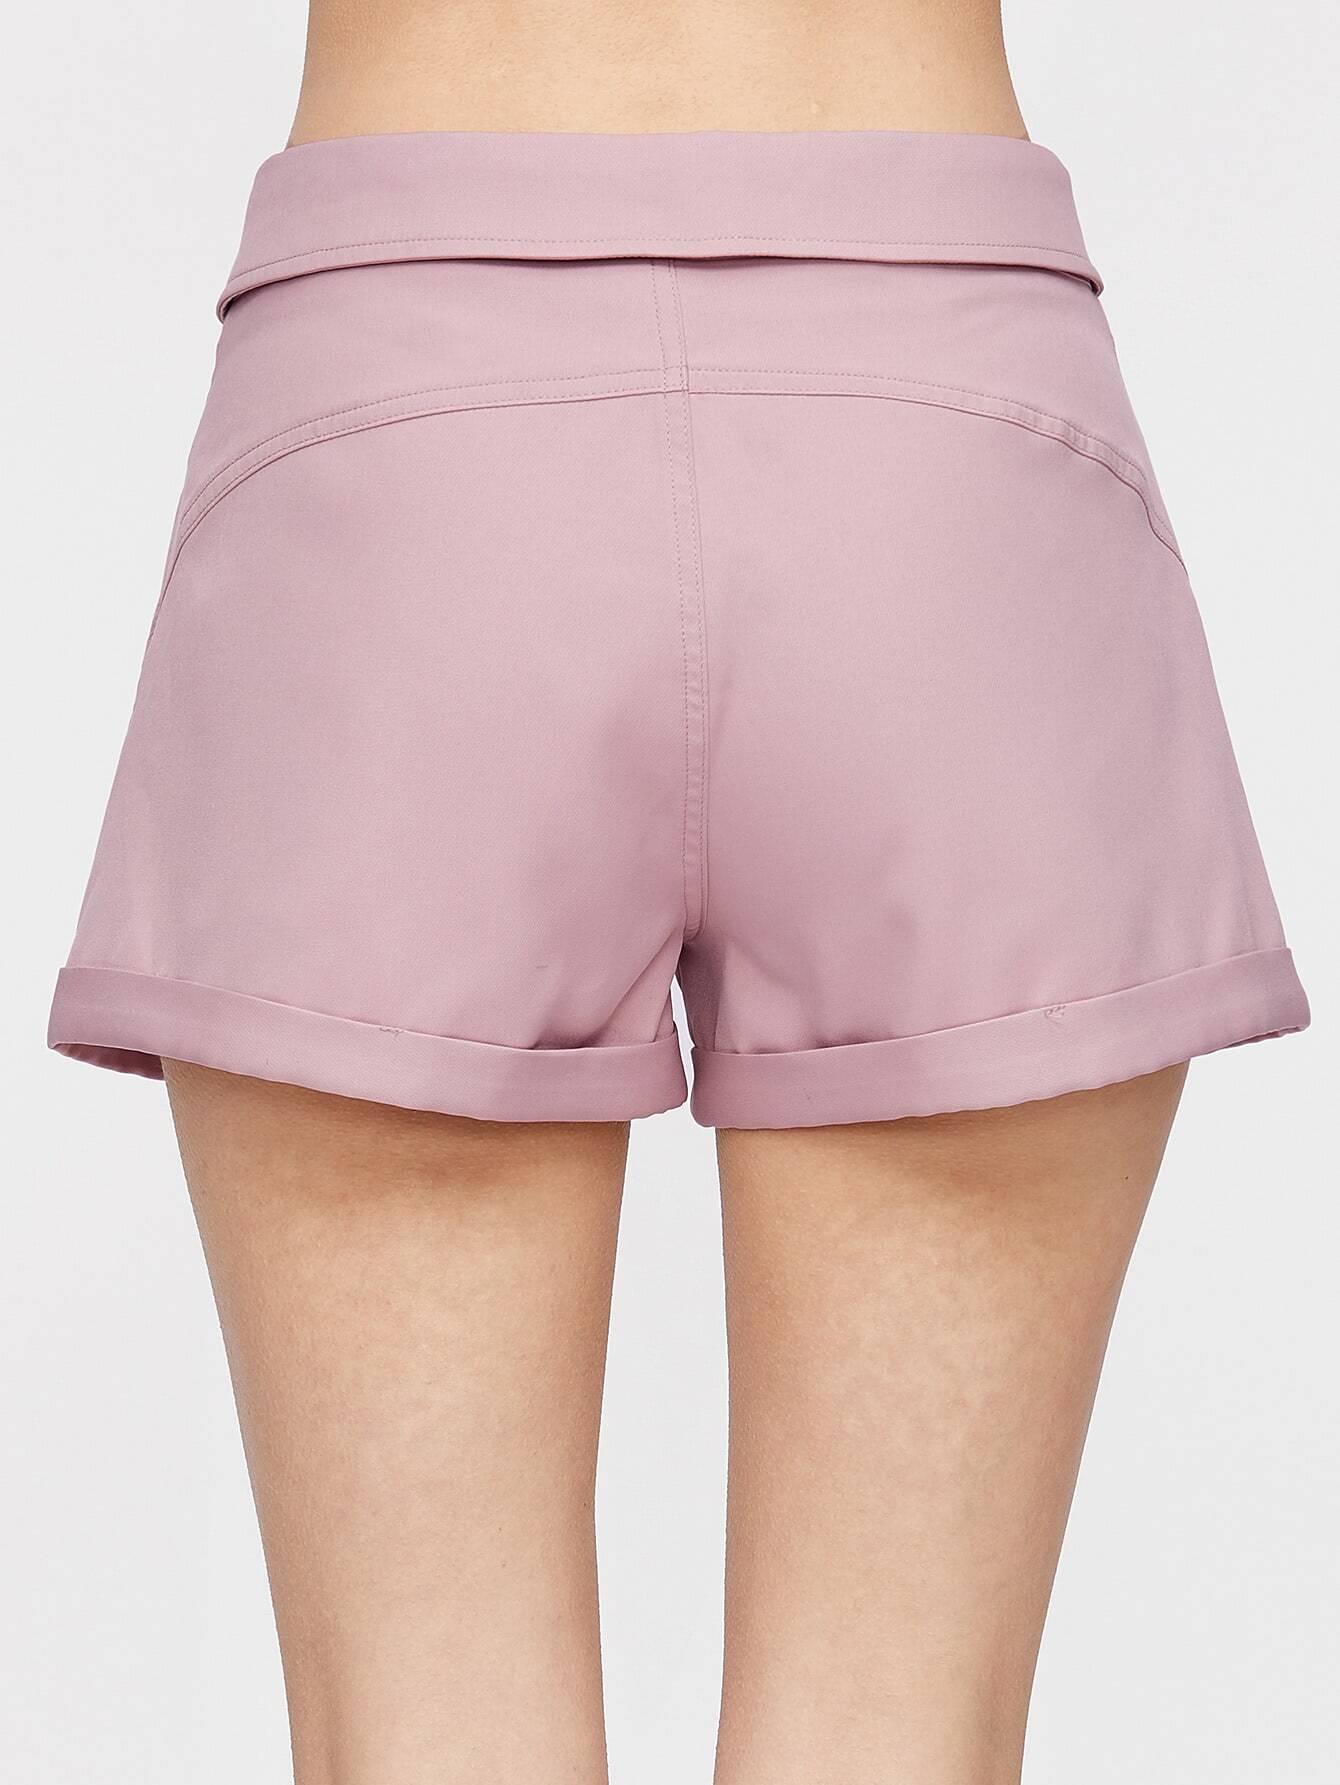 shorts170314701_2